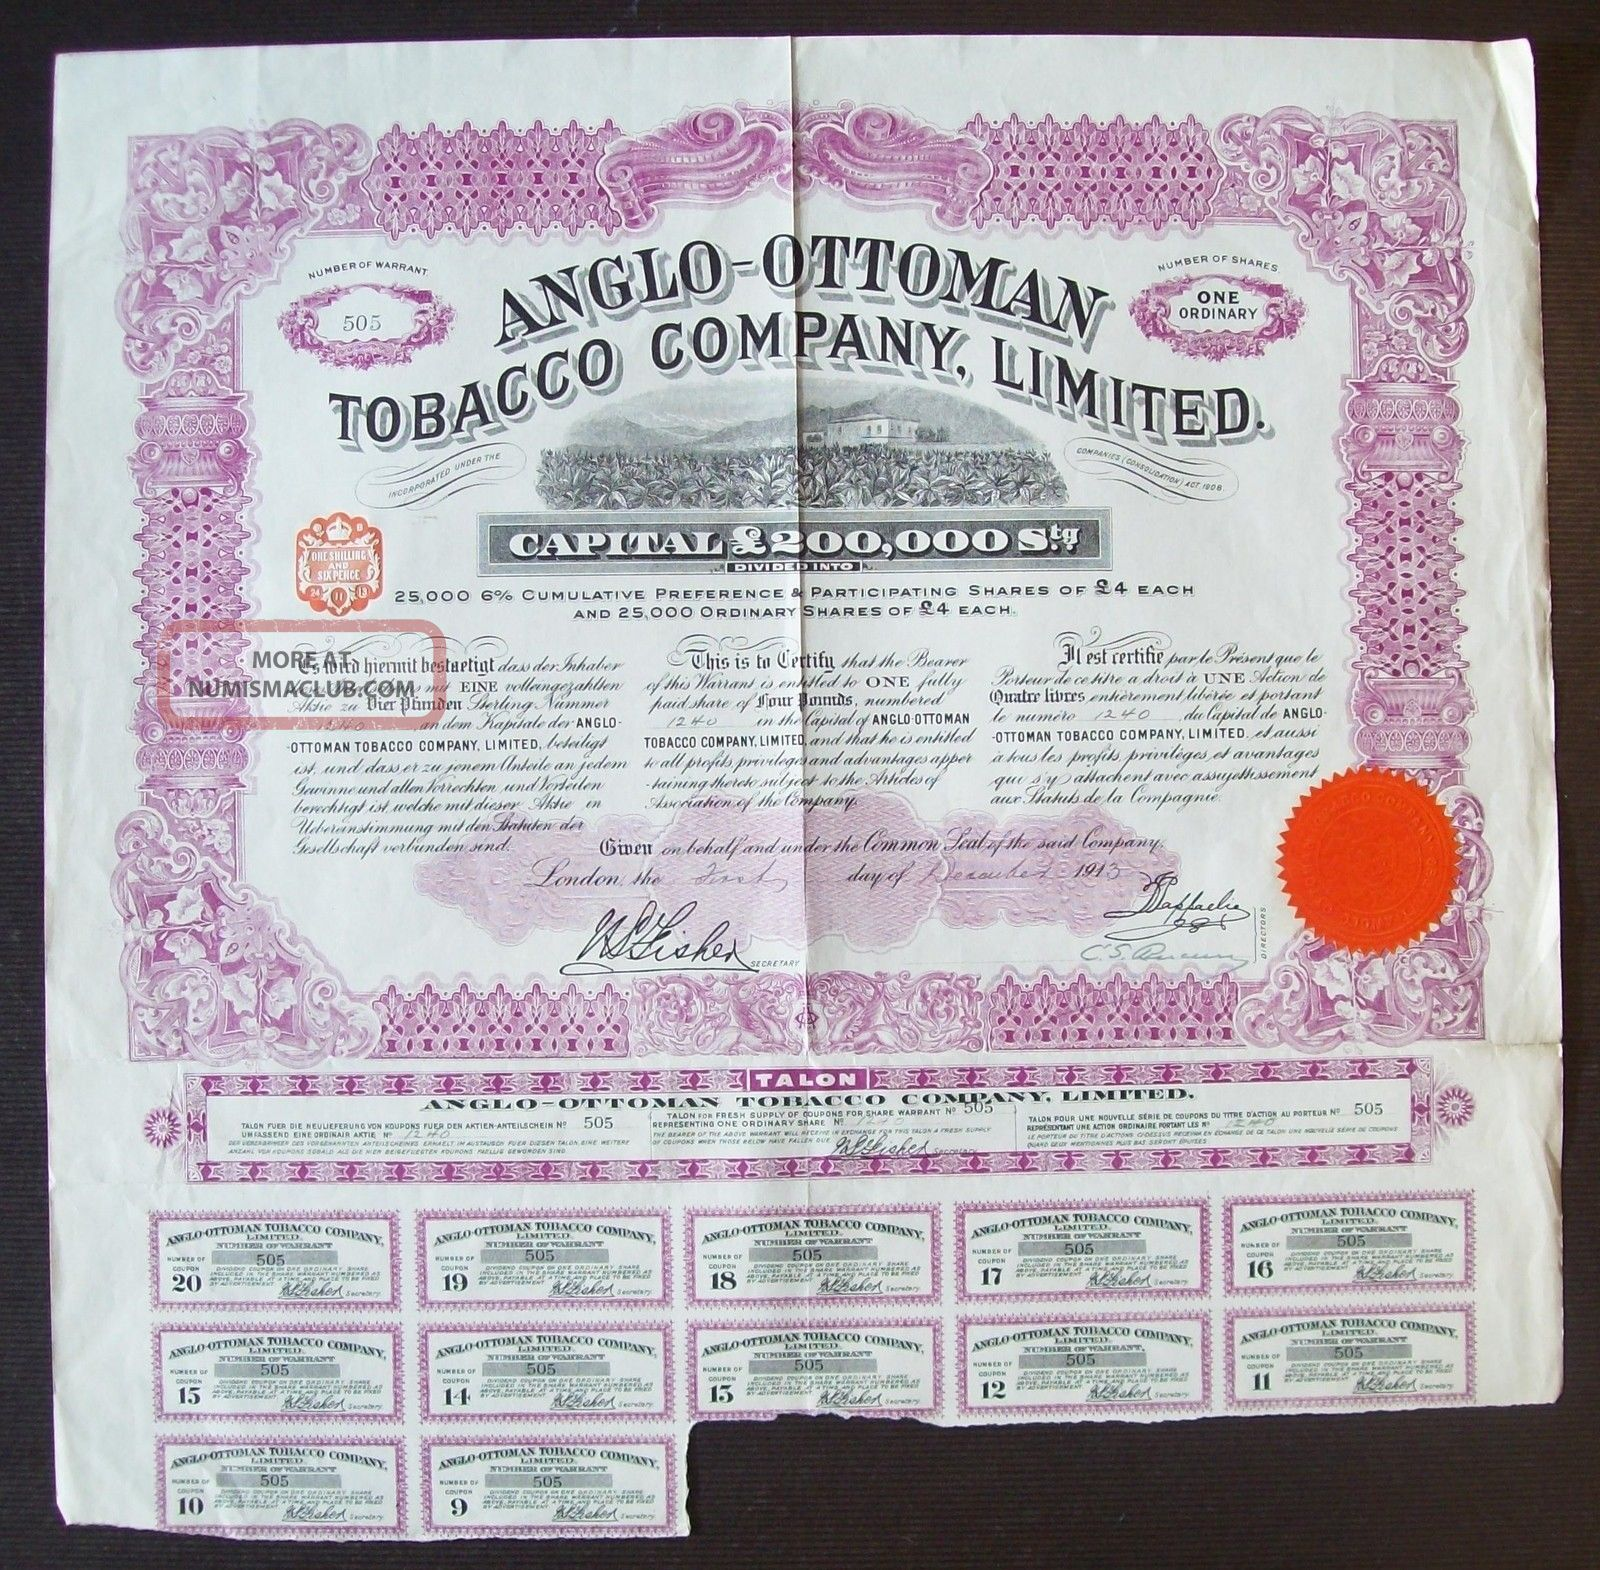 Gb England 1913 Illustrated Bond Anglo - Ottoman Tobacco Co.  Ltd - Tabac.  R4049 World photo